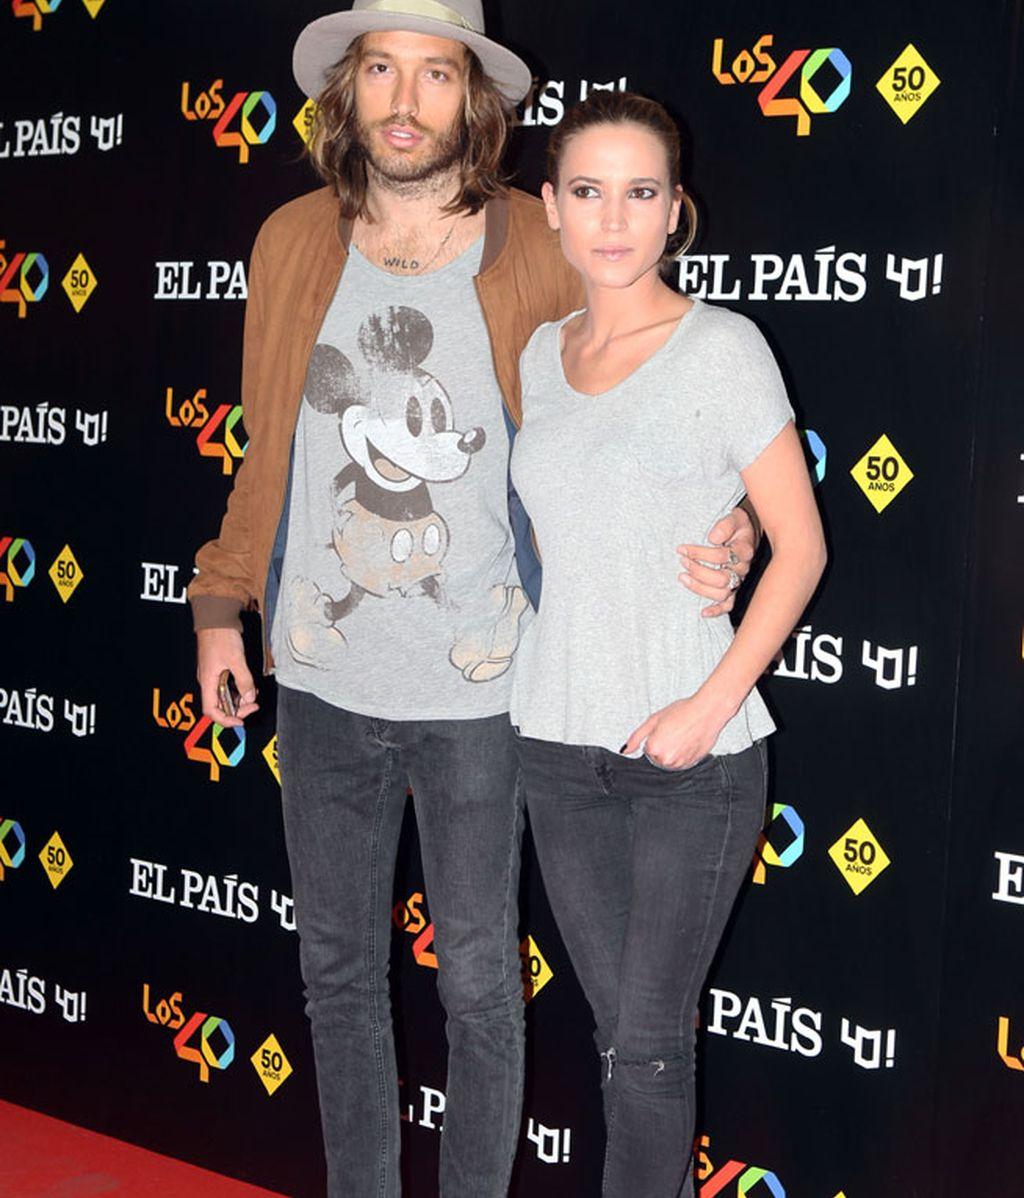 Ana Fernández y Adrián Roma se estrenan posando juntos en un 'photocall'